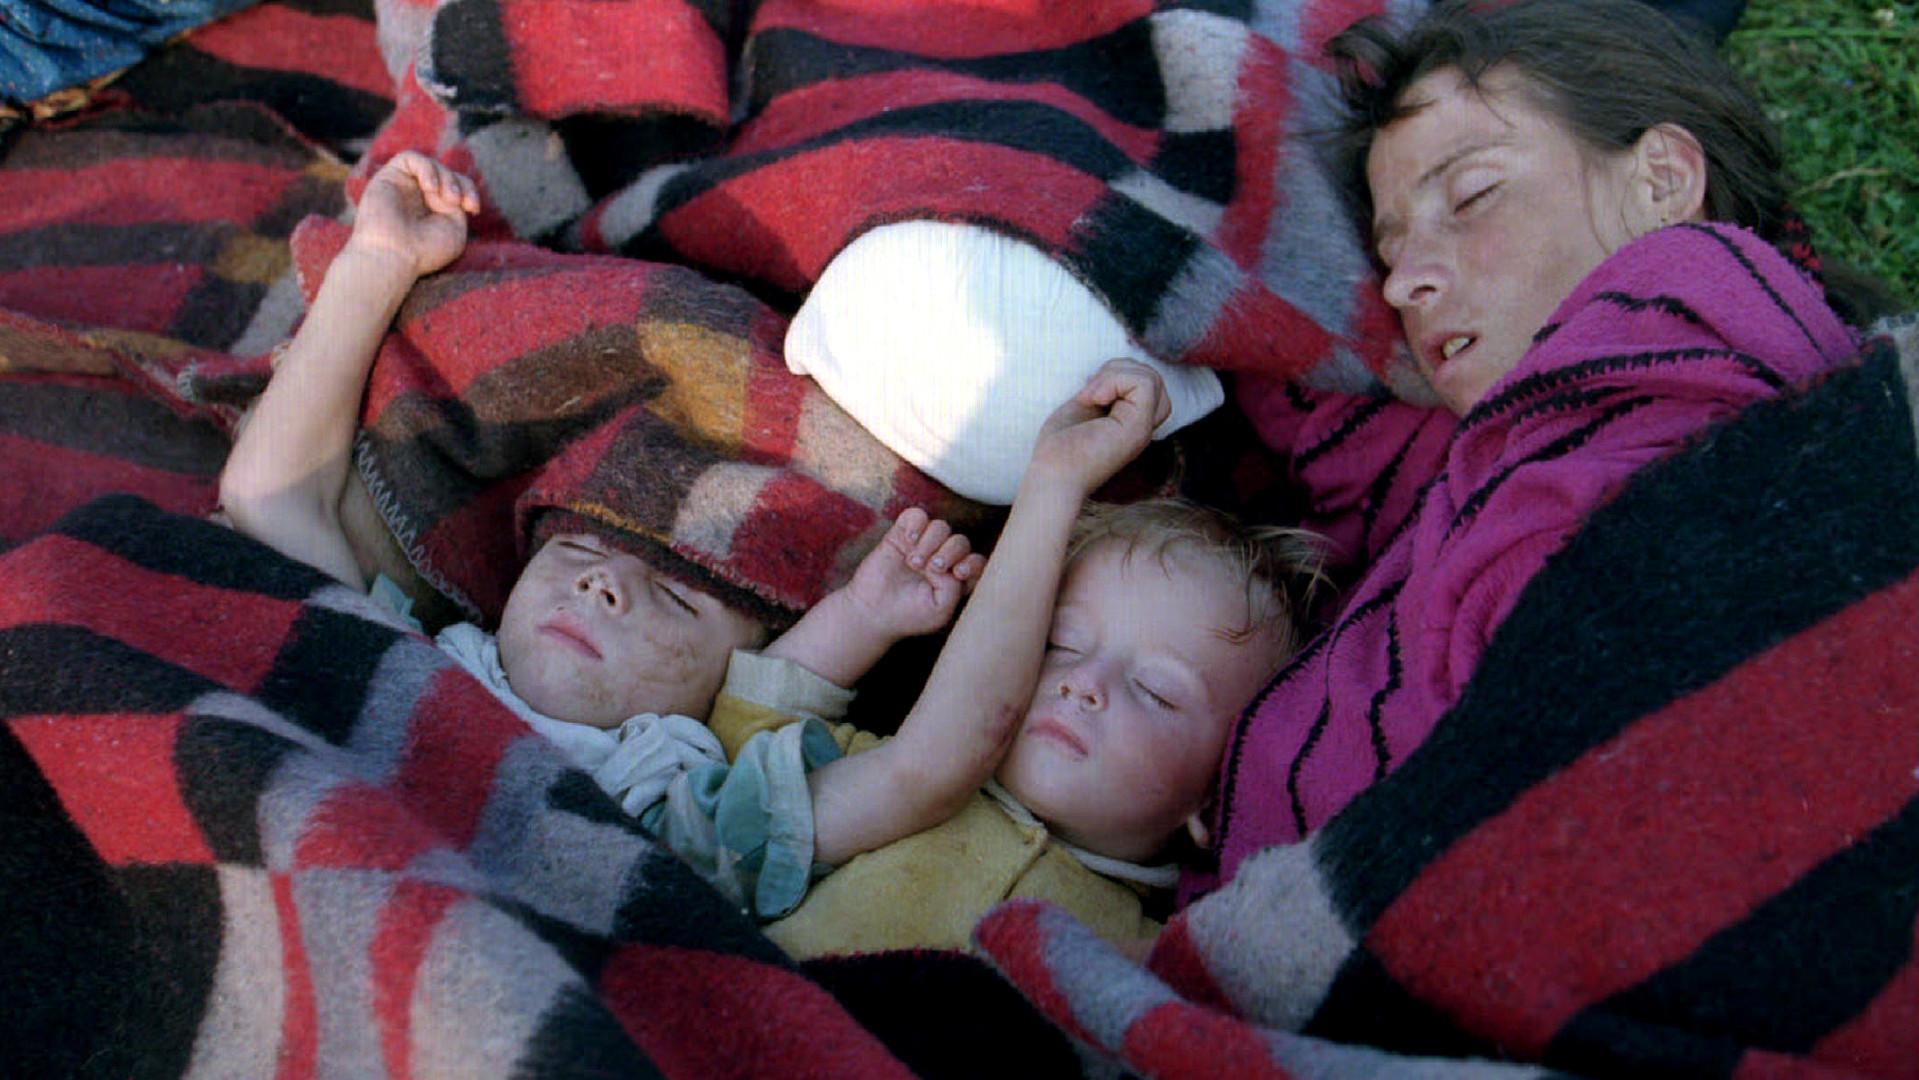 Des réfugiés de Srebrenica dans un camp de réfugiés de l'ONU